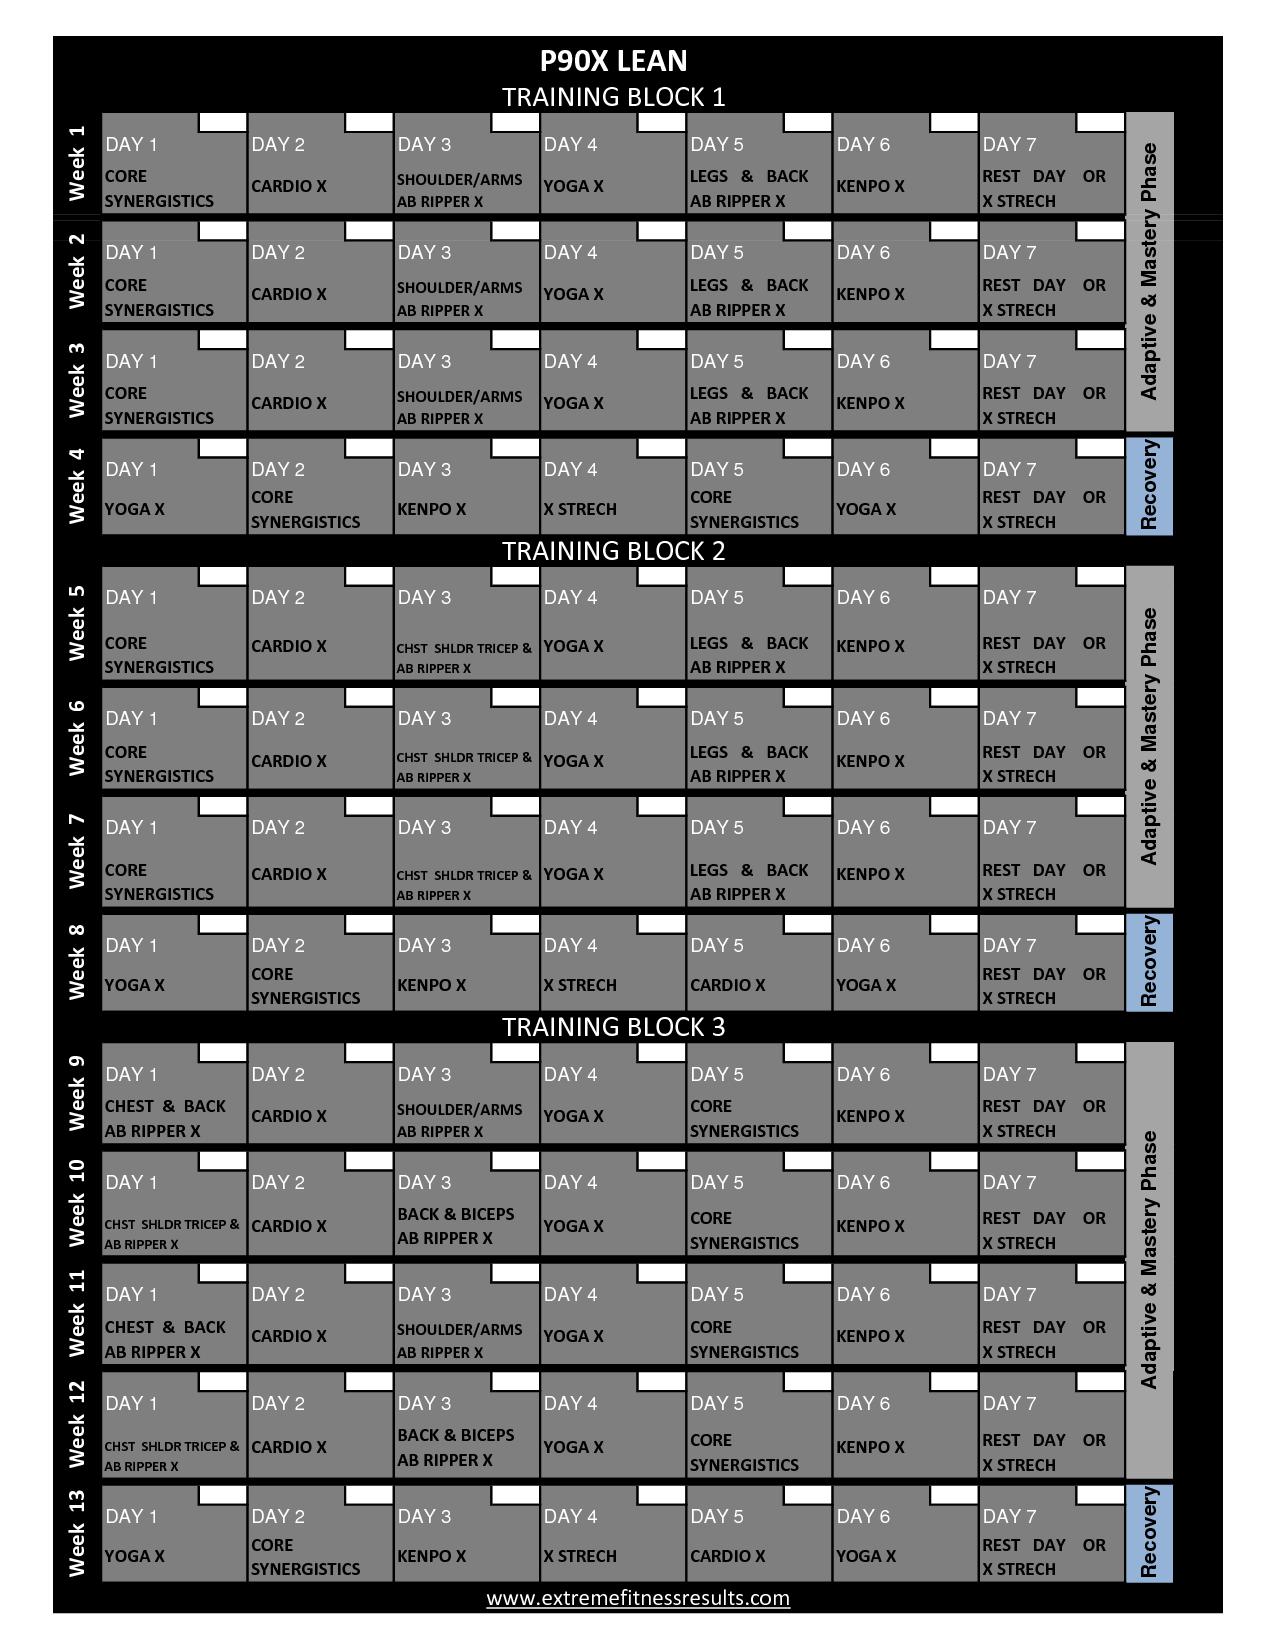 P90x Workout Schedule